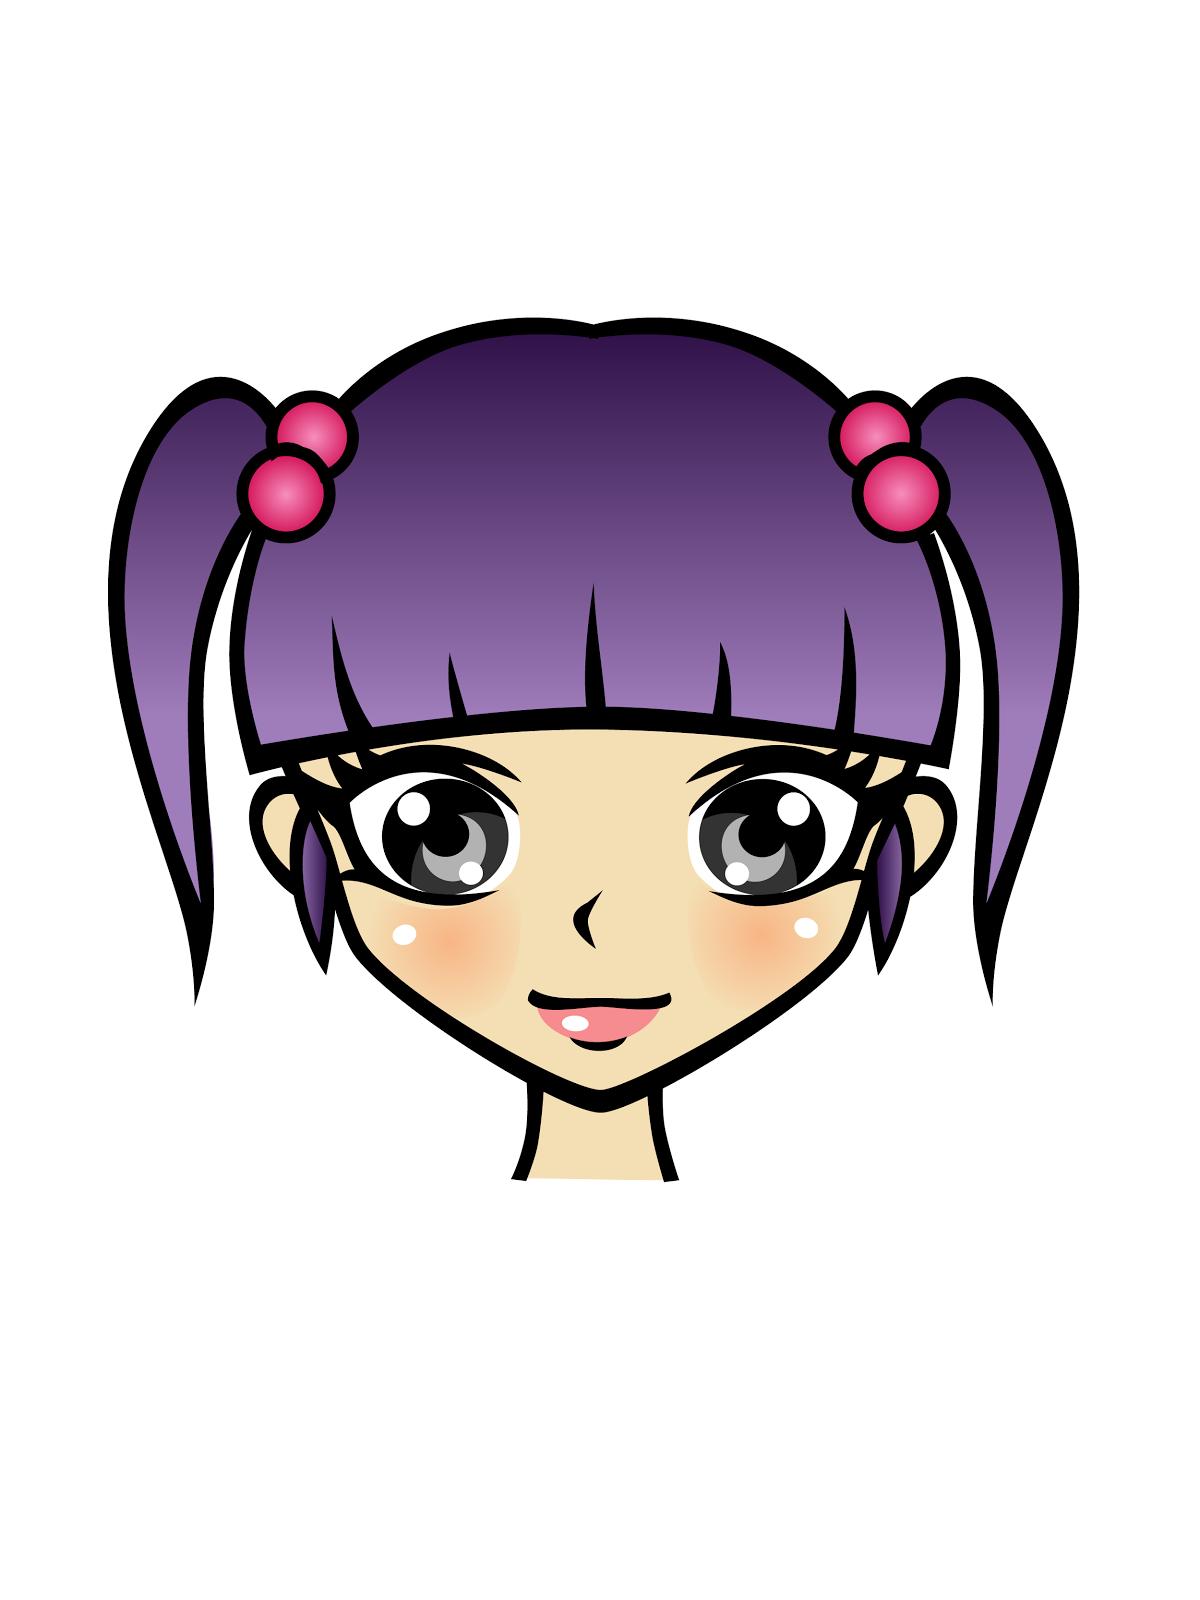 Cute cartoon girl clipart graphic free Free Cartoon Girl Cliparts, Download Free Clip Art, Free Clip Art on ... graphic free